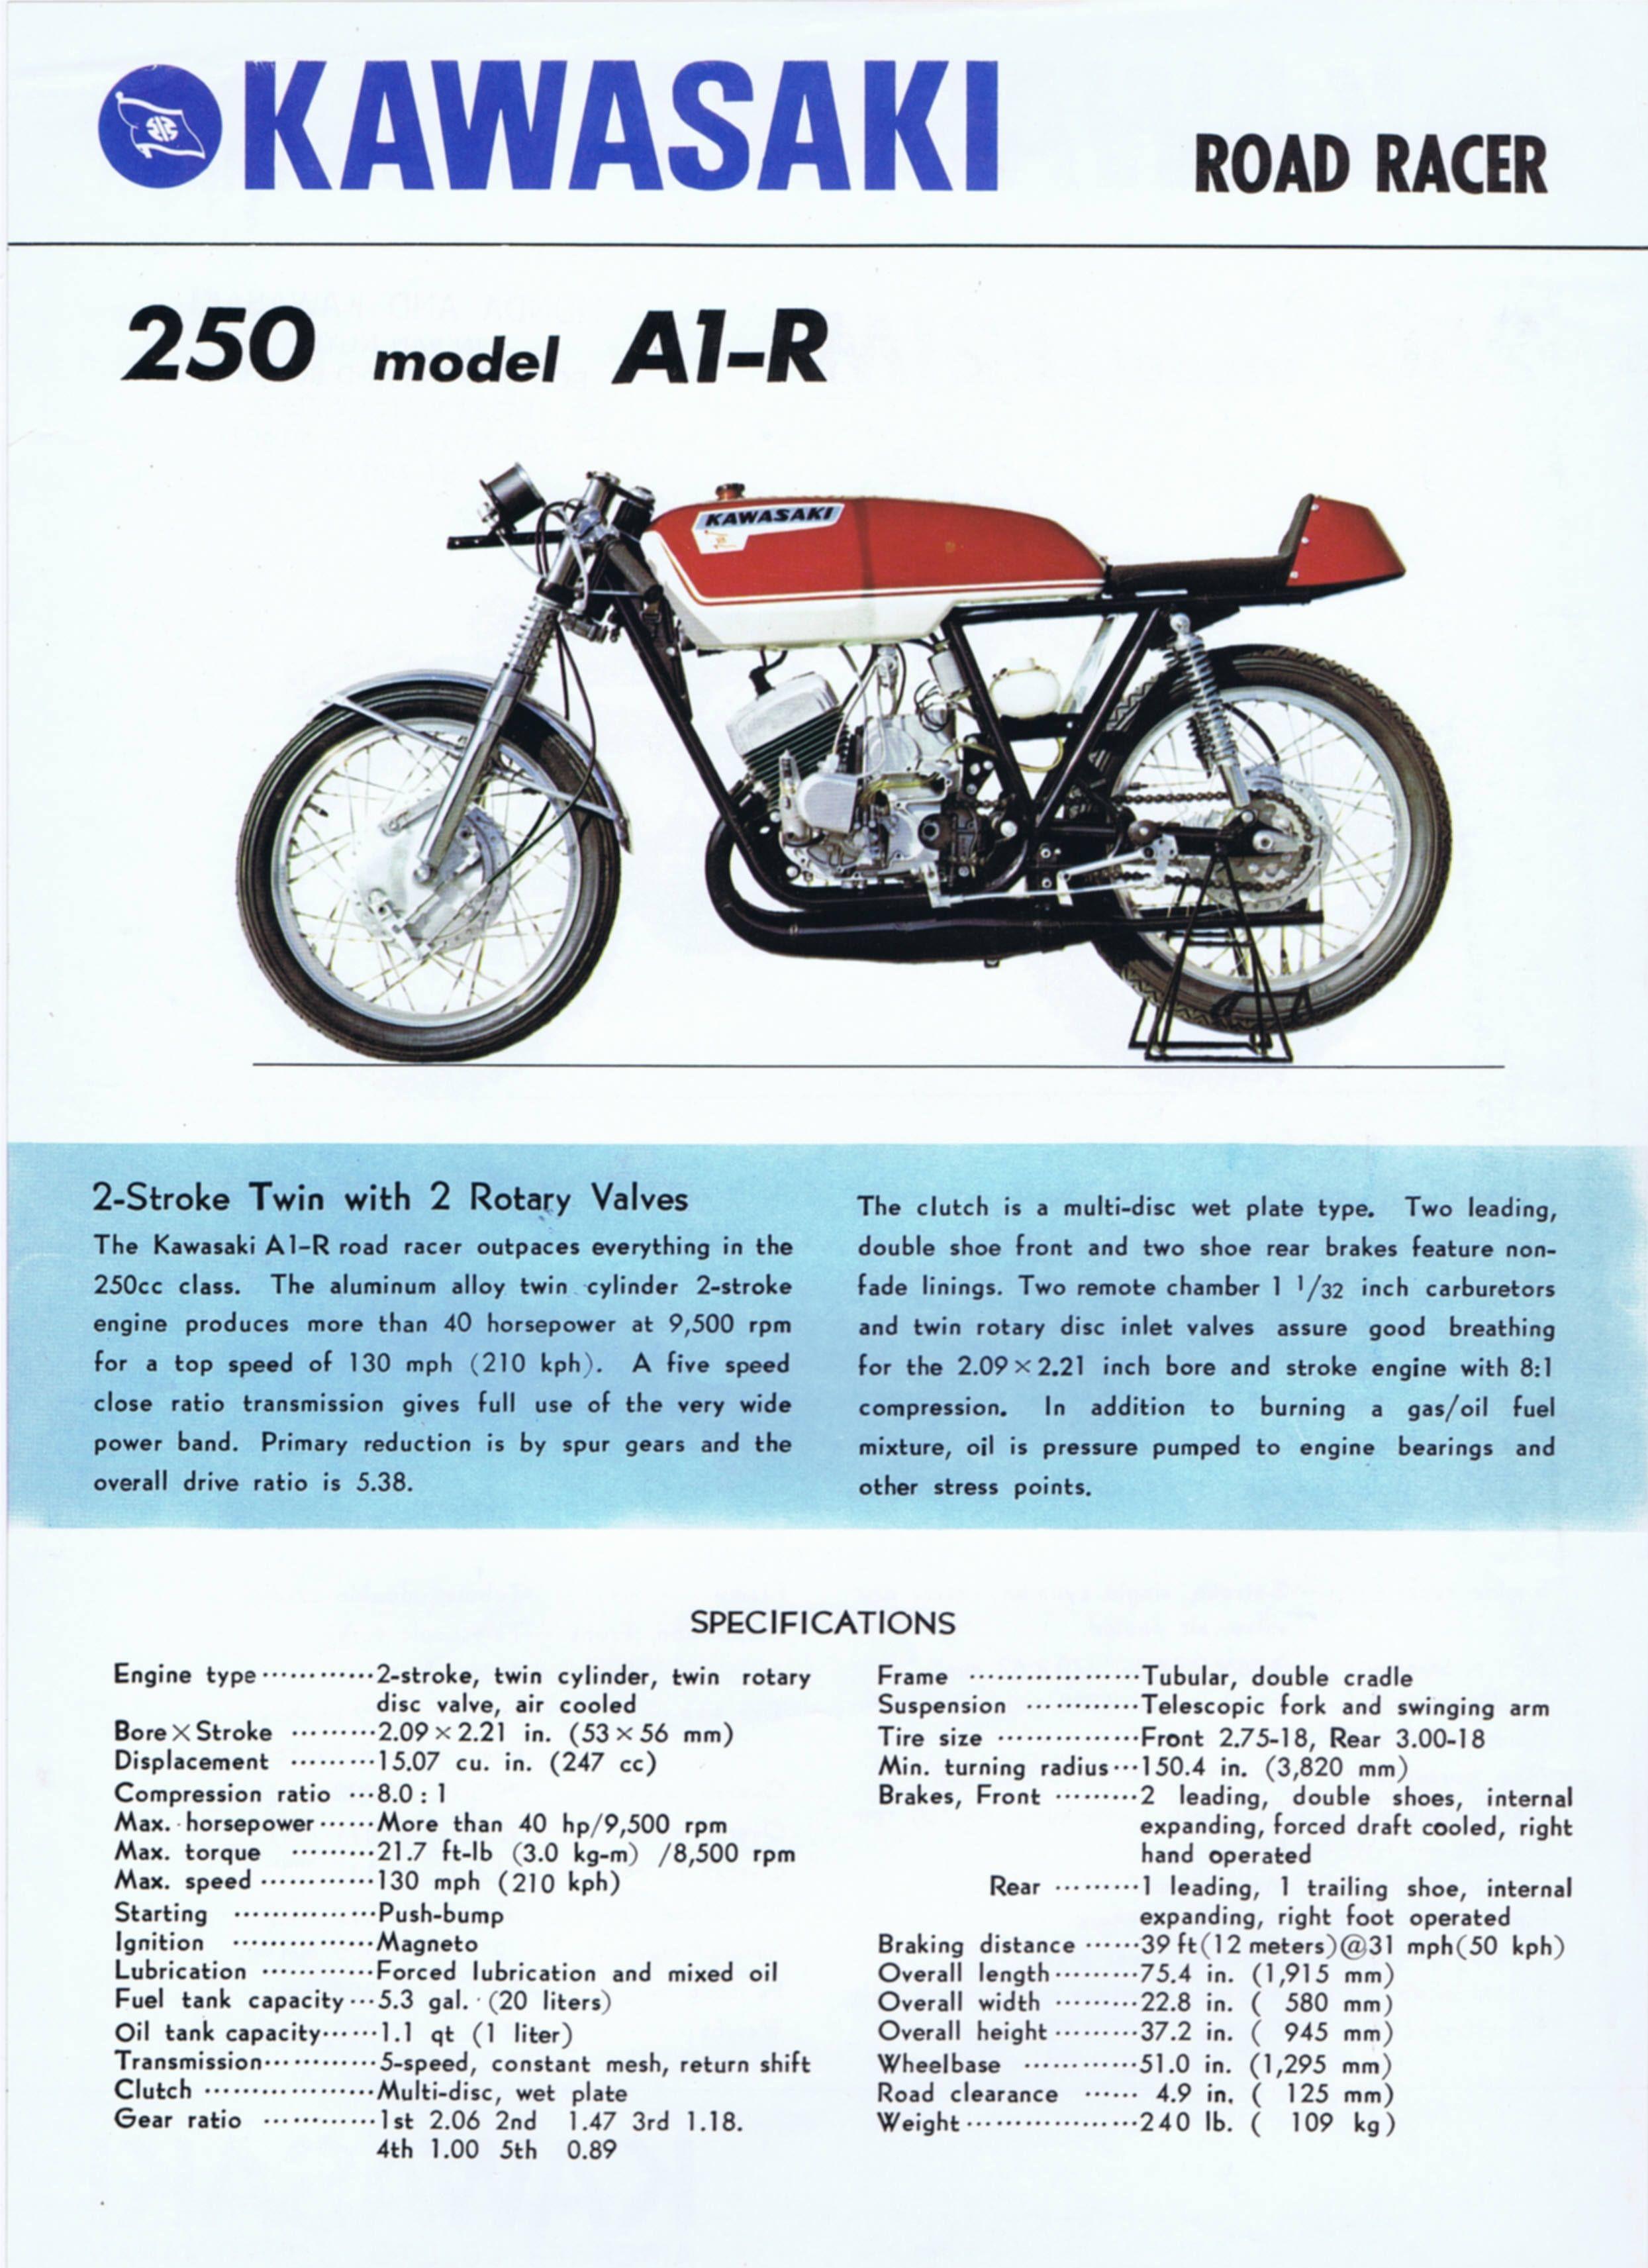 1969_Kawasaki 250 A1-R + 250 F21M 2-stroke USA_01   バイク